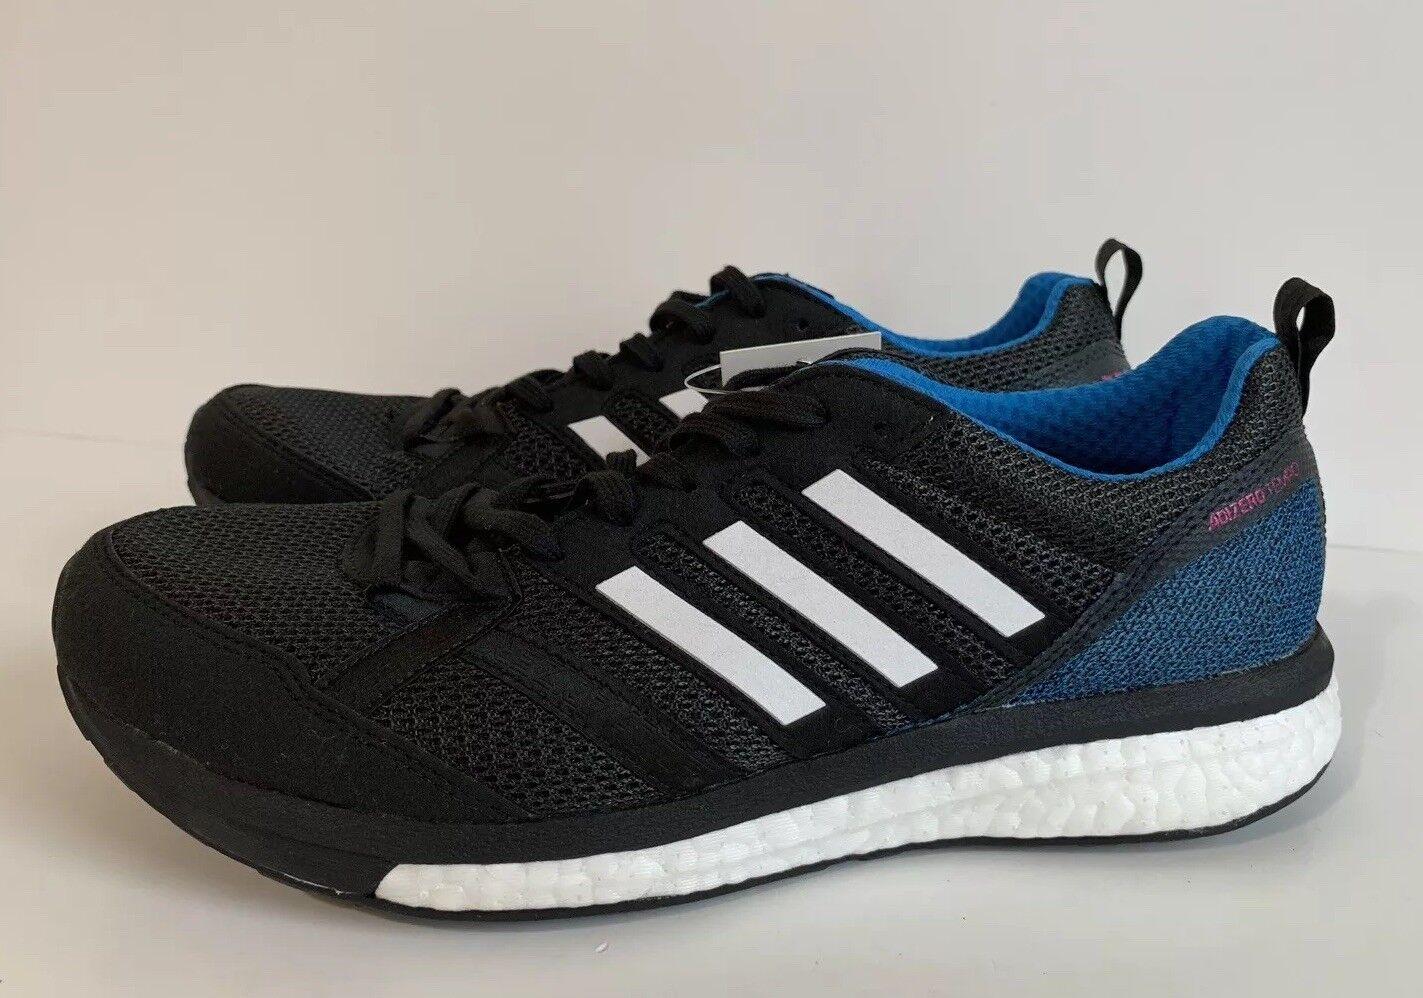 Adidas Adizero Tempo 9 Women's Running shoes Black bluee Pink AH2587 Sz 9.5